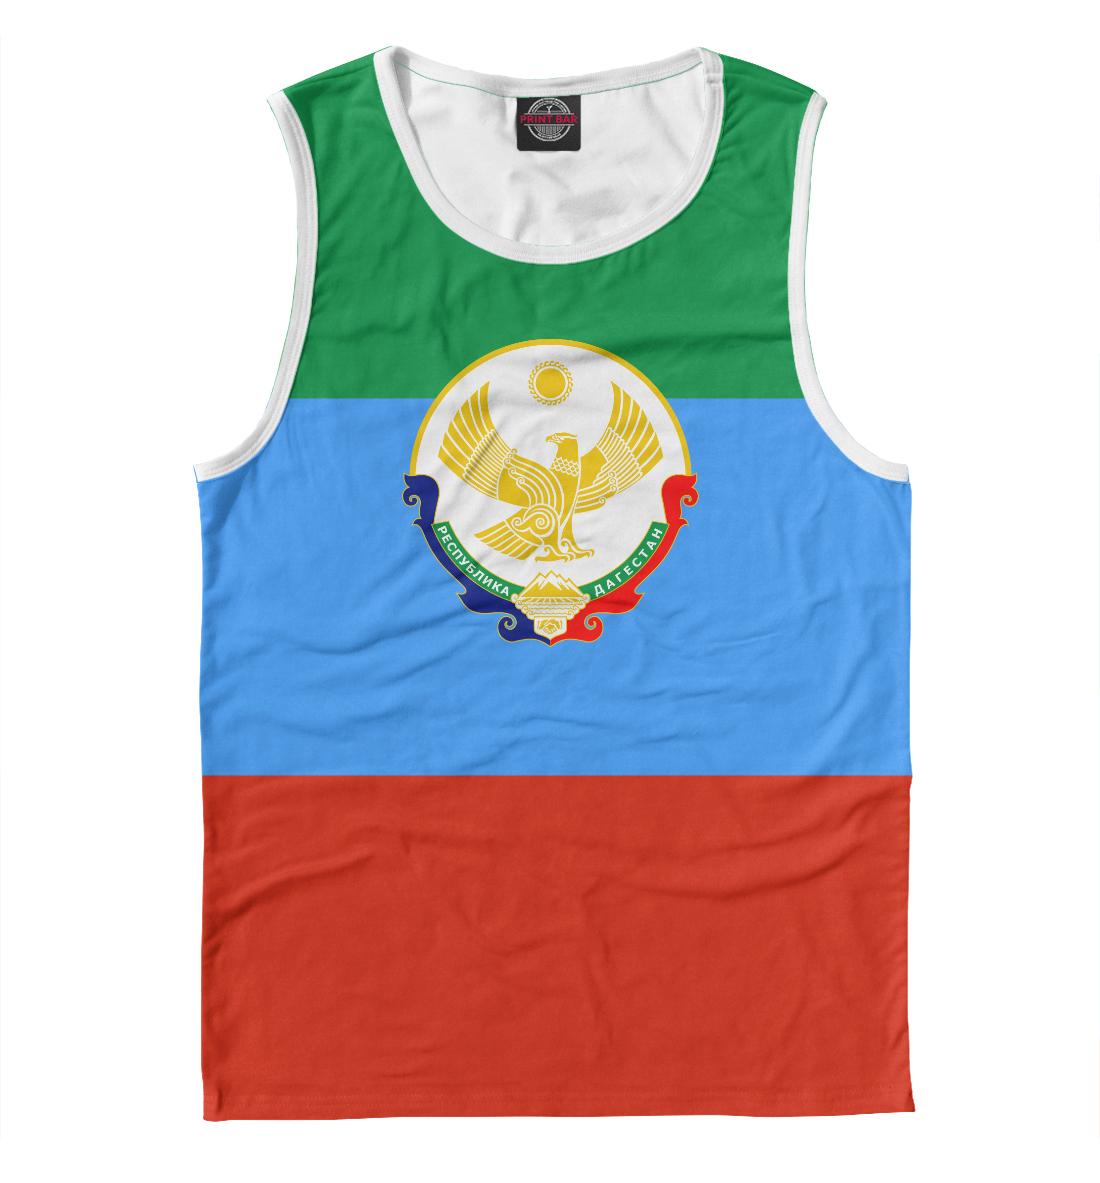 Купить Дагестан, Printbar, Майки, VSY-164431-may-2